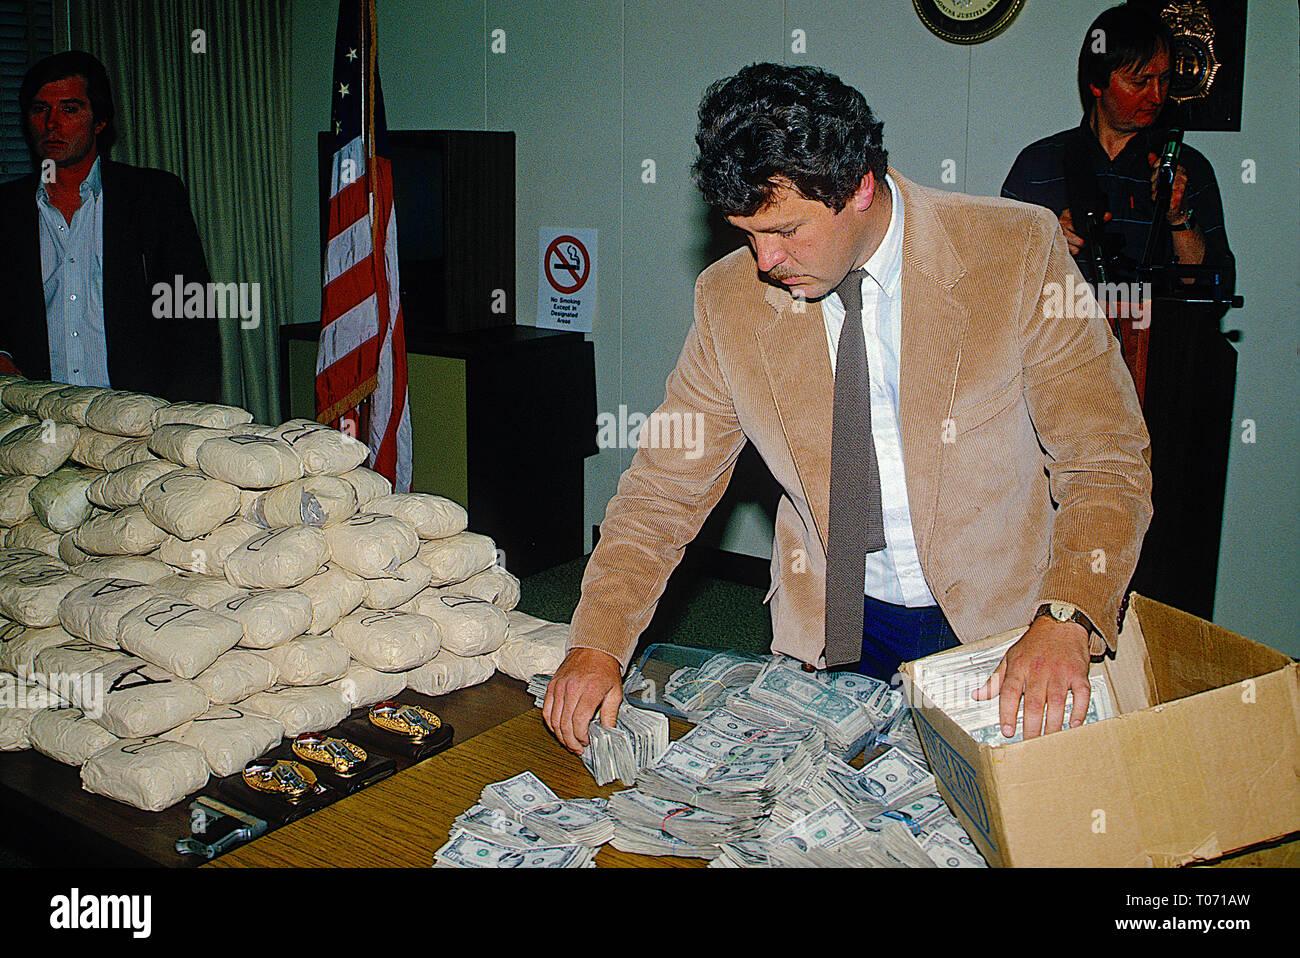 Kilos Of Cocaine Stock Photos & Kilos Of Cocaine Stock Images - Alamy